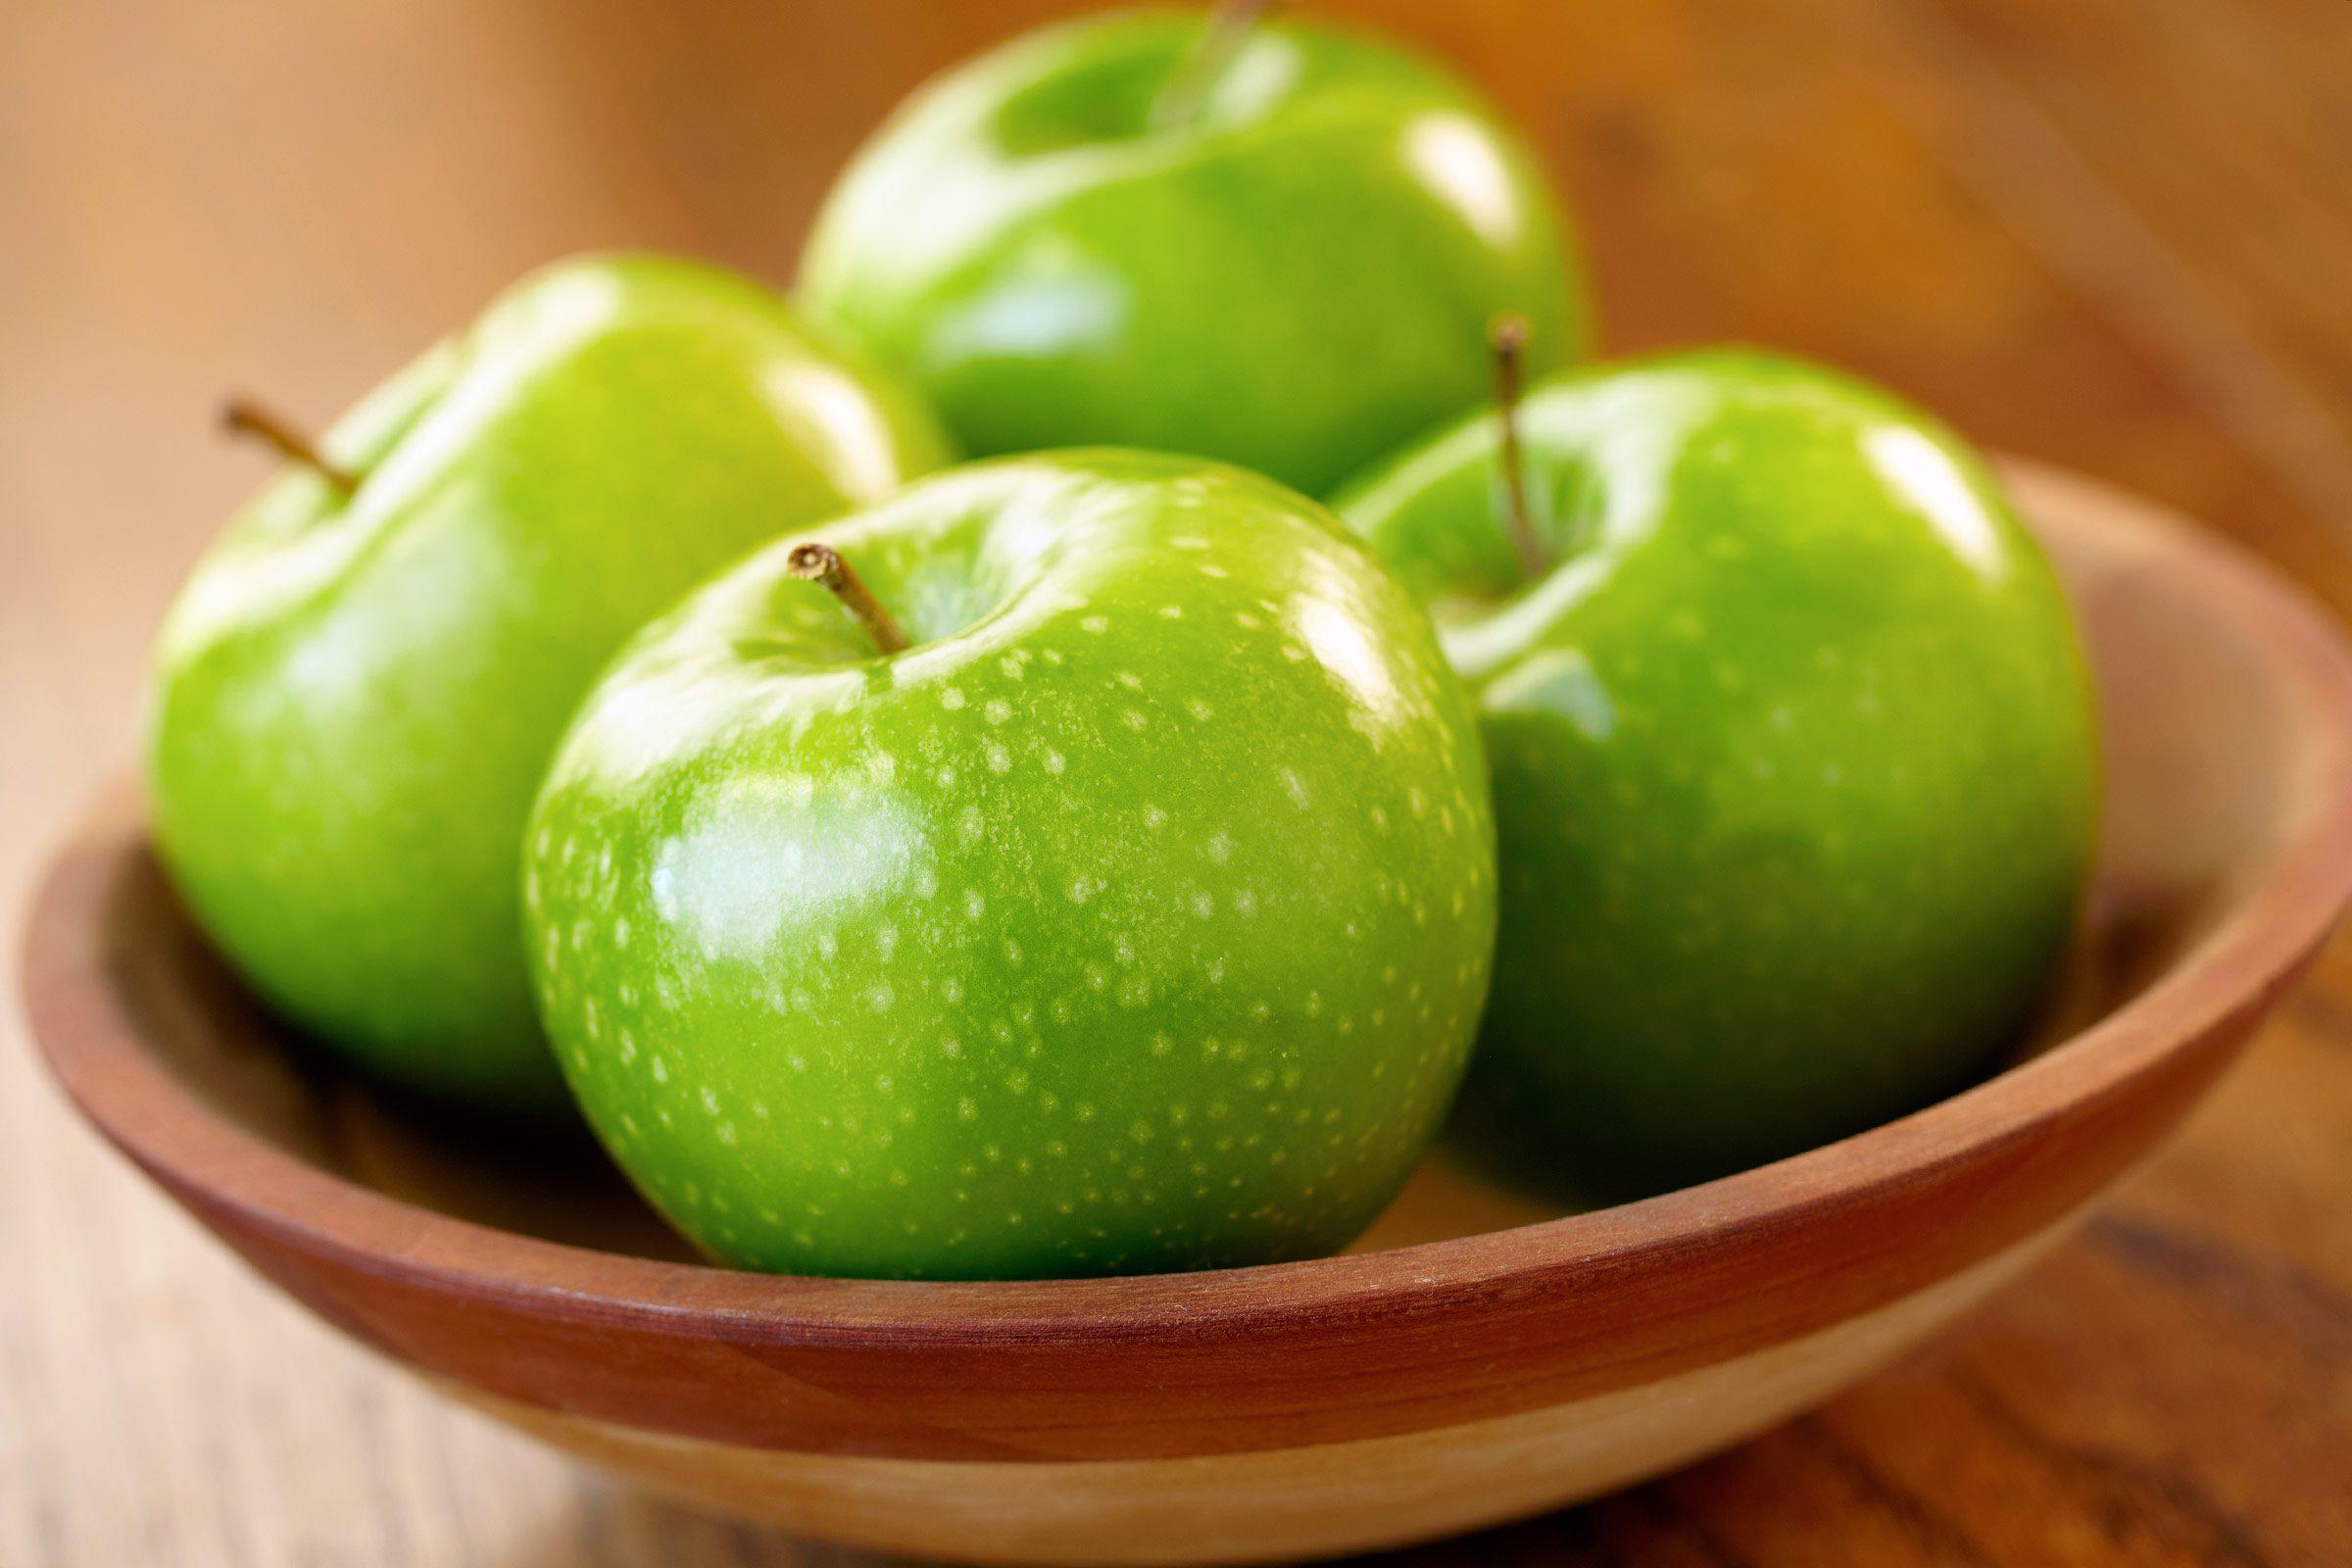 10. An apple or sugar-free apple sauce?